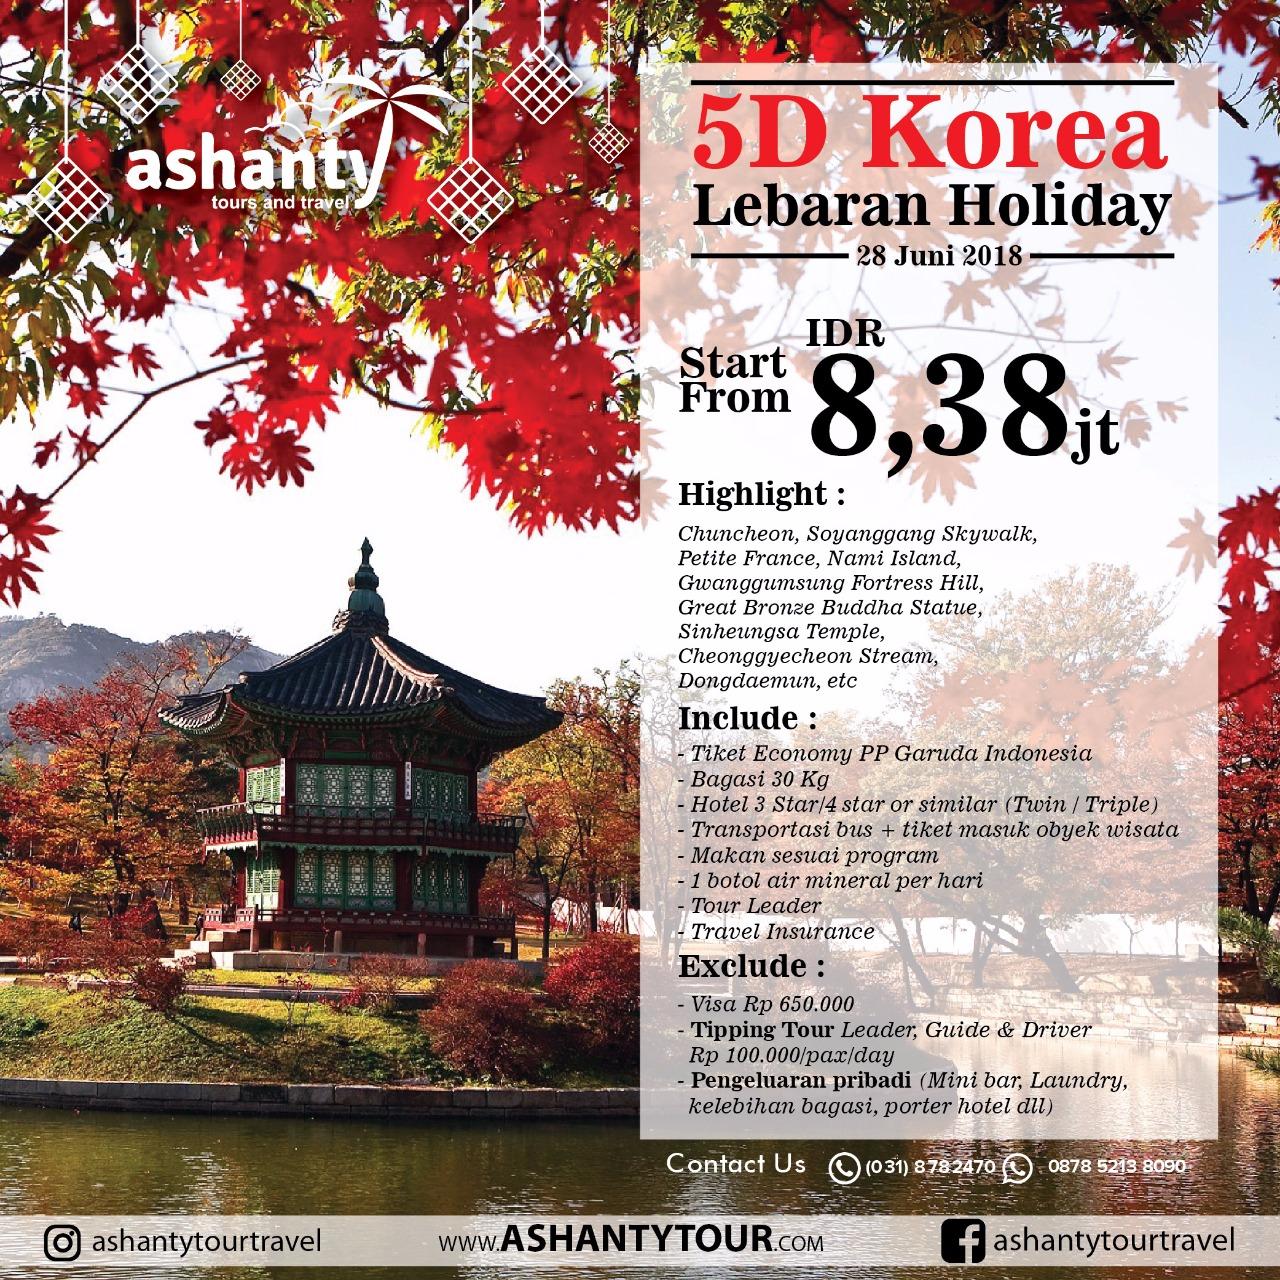 paket tour korea murah surabaya, harga paket tour ke korea dari surabaya, paket wisata korea dari surabaya